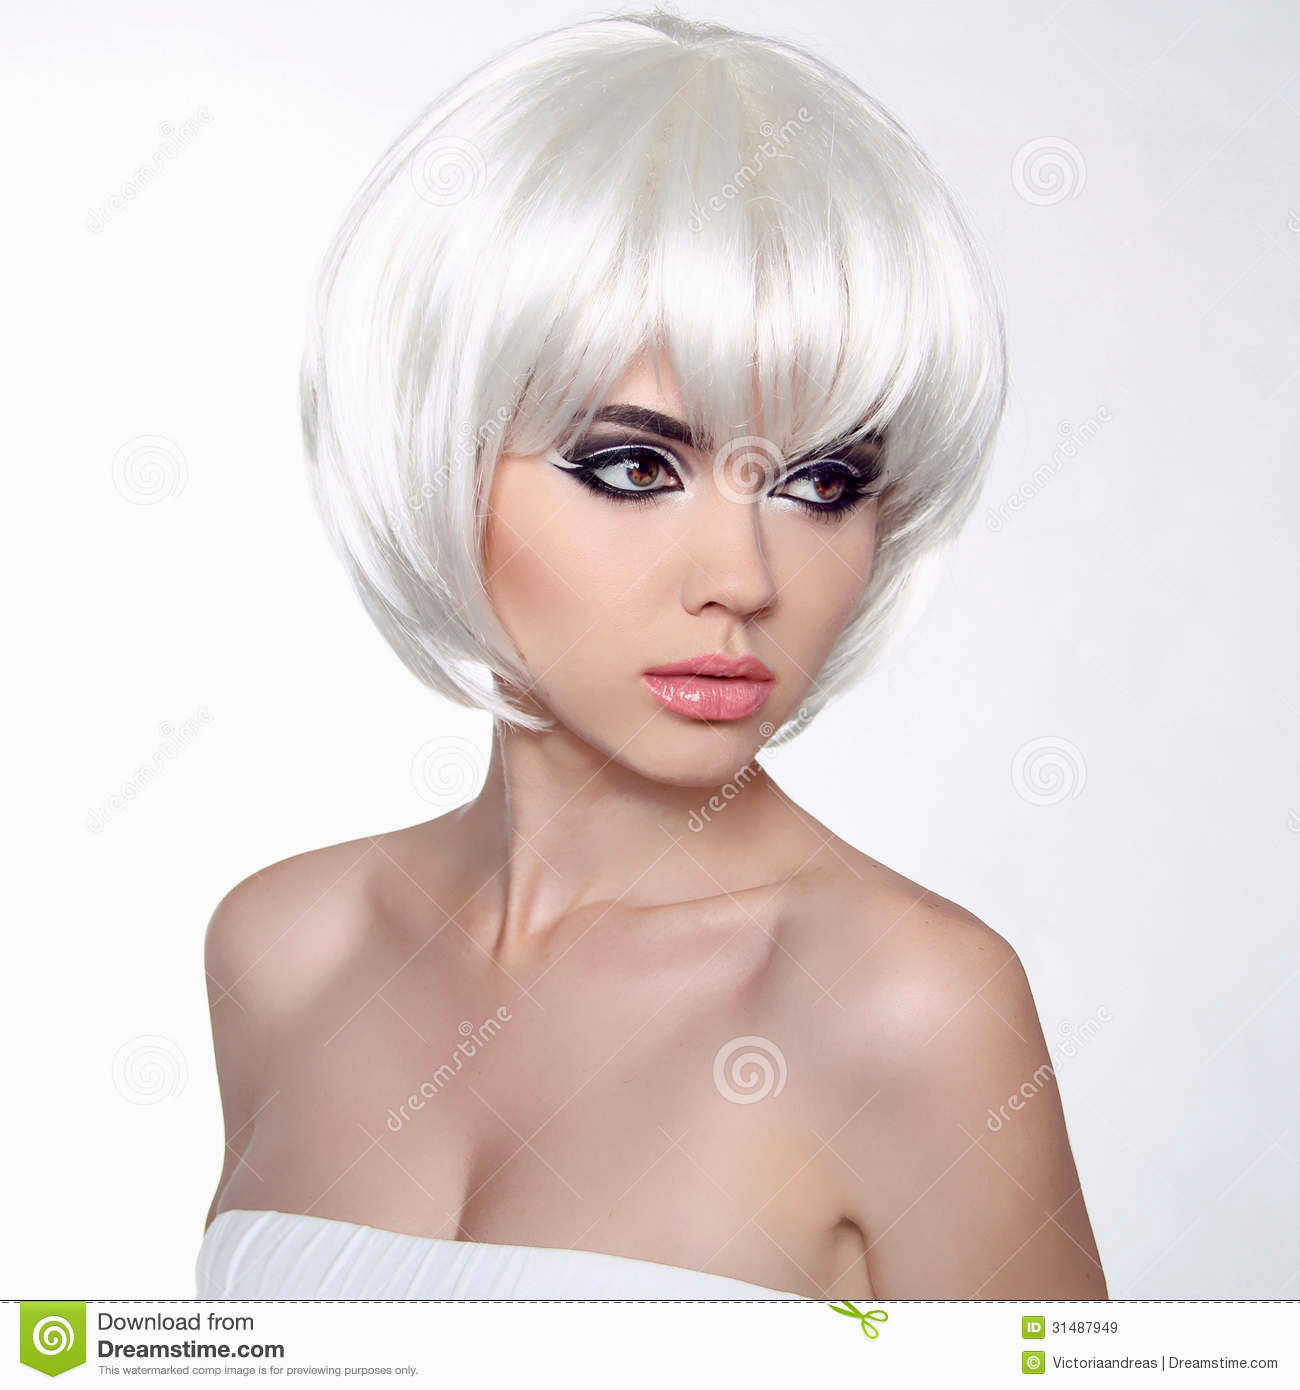 new modelo de corte de cabelo feminino curto retrato-Unique Modelo De Corte De Cabelo Feminino Curto Foto